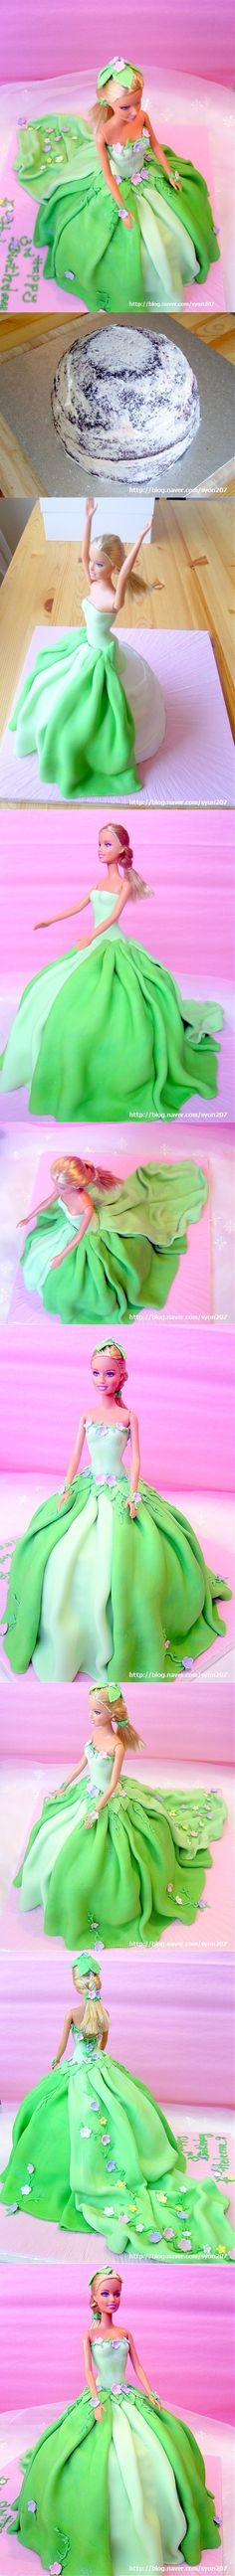 Barbie Sugar cake